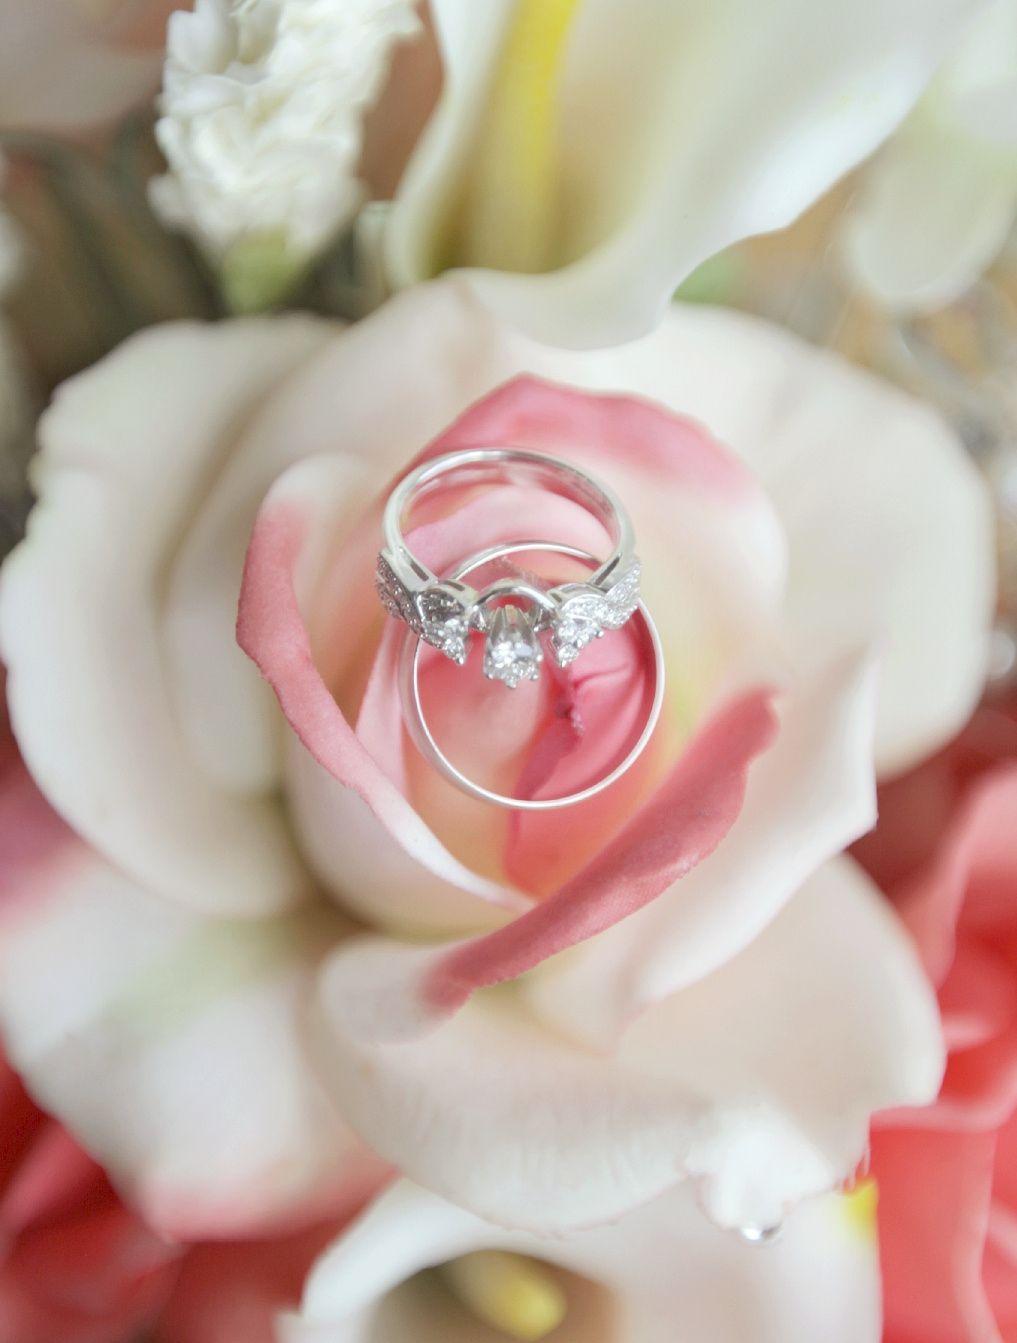 Rings on Bouquet by Daniel | Просто красиво... | Pinterest